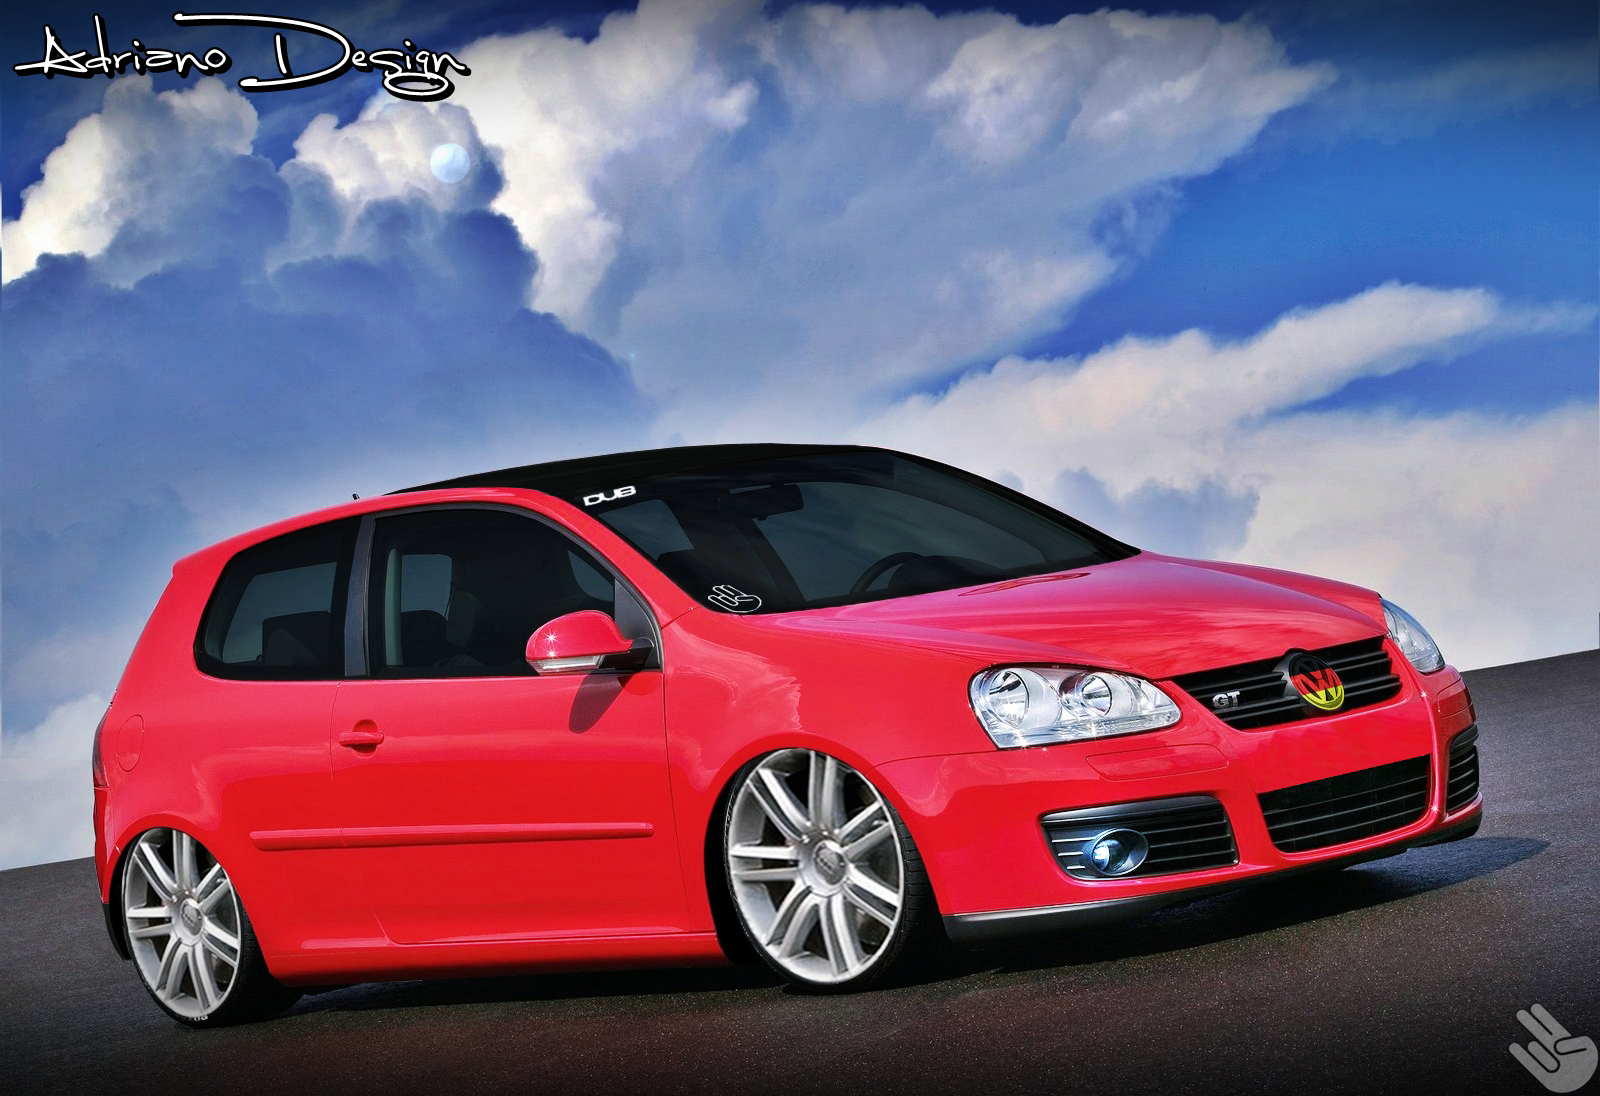 http://2.bp.blogspot.com/-SnoC2VT49xA/T9K7rJJ7ymI/AAAAAAAAAKQ/KK7viao00iI/s1600/Volkswagen-Golf_GT_2006_1600x1200_wallpaper_033323+c%C3%B3pia.jpg